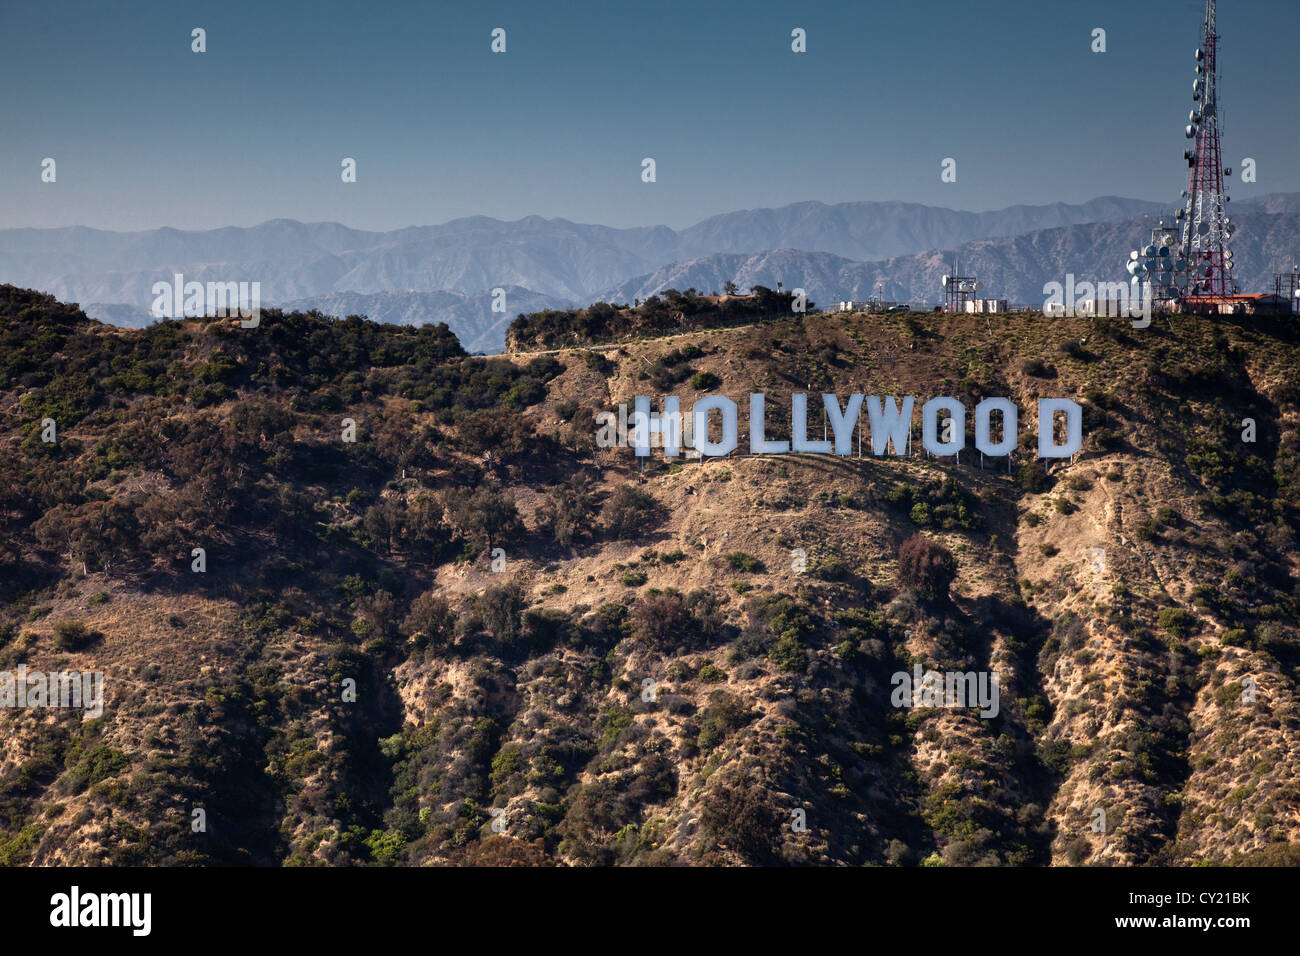 Die legendären Hollywood-Schild in den Hollywood HIlls, Los Angeles. Stockbild